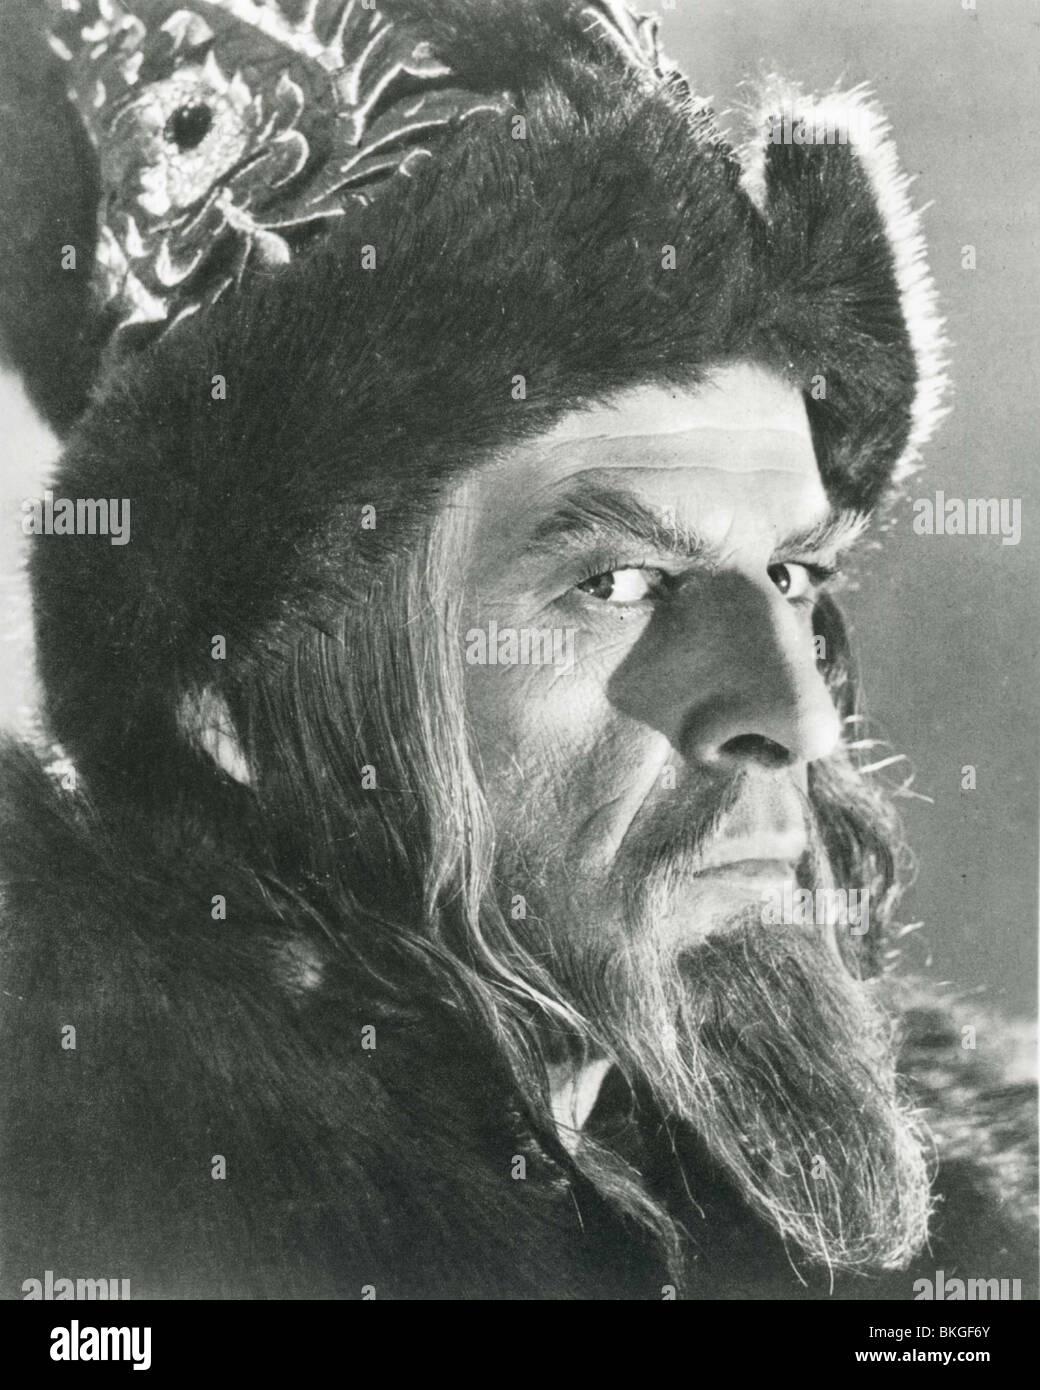 IVAN GROZNI (1942) IVAN THE TERRIBLE (ALT) NIKOLAI CHERKASOV IVTB 002P - Stock Image